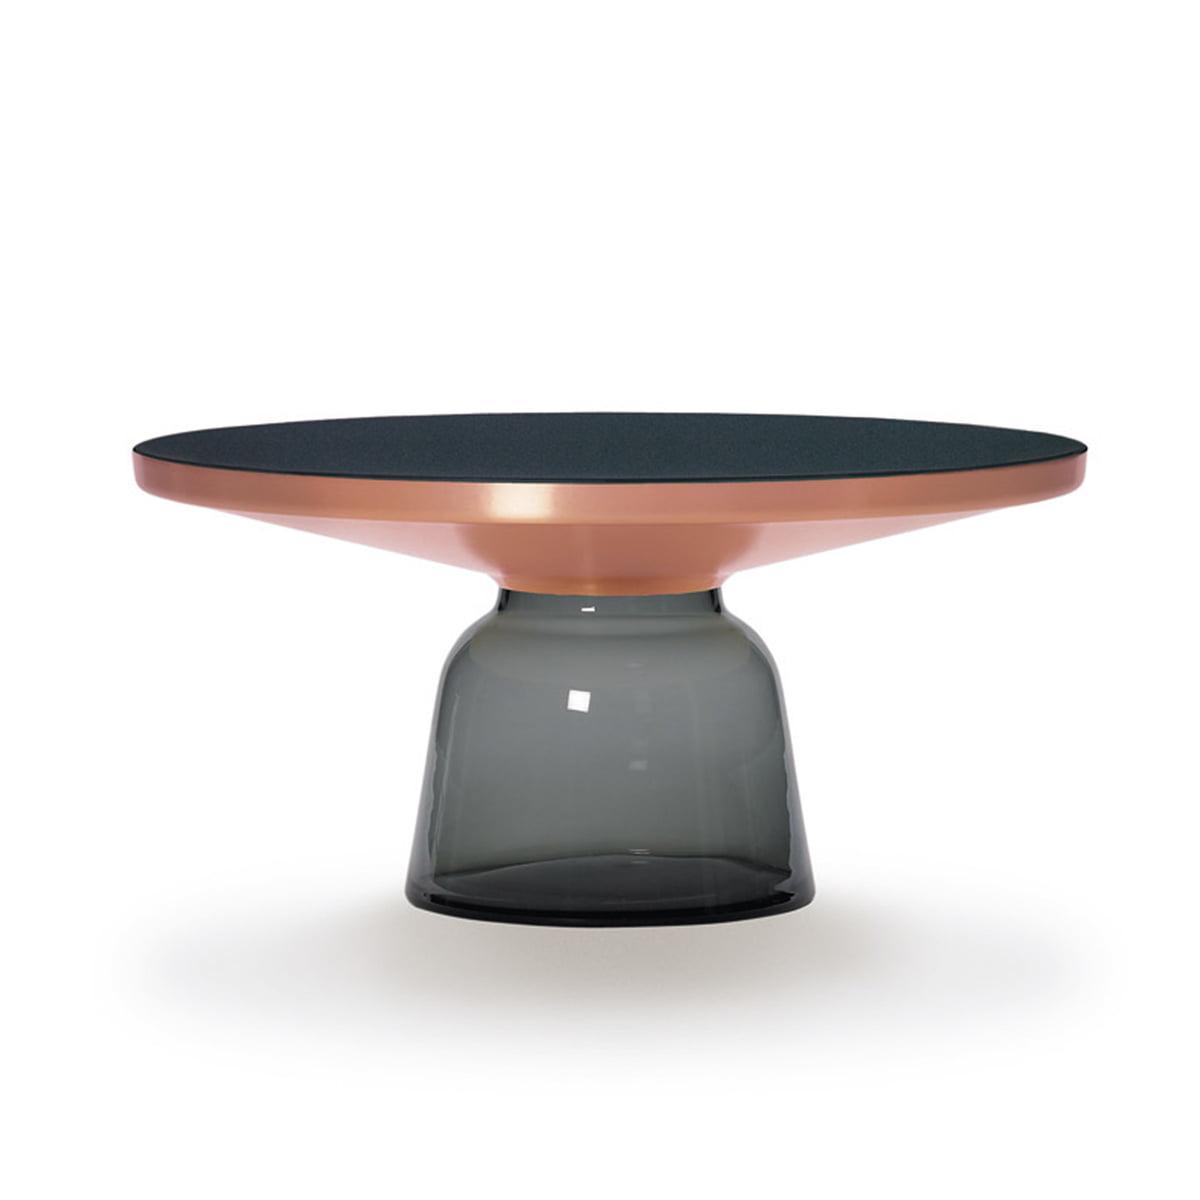 ClassiCon - Bell Coffee Table copper /grey - single picture